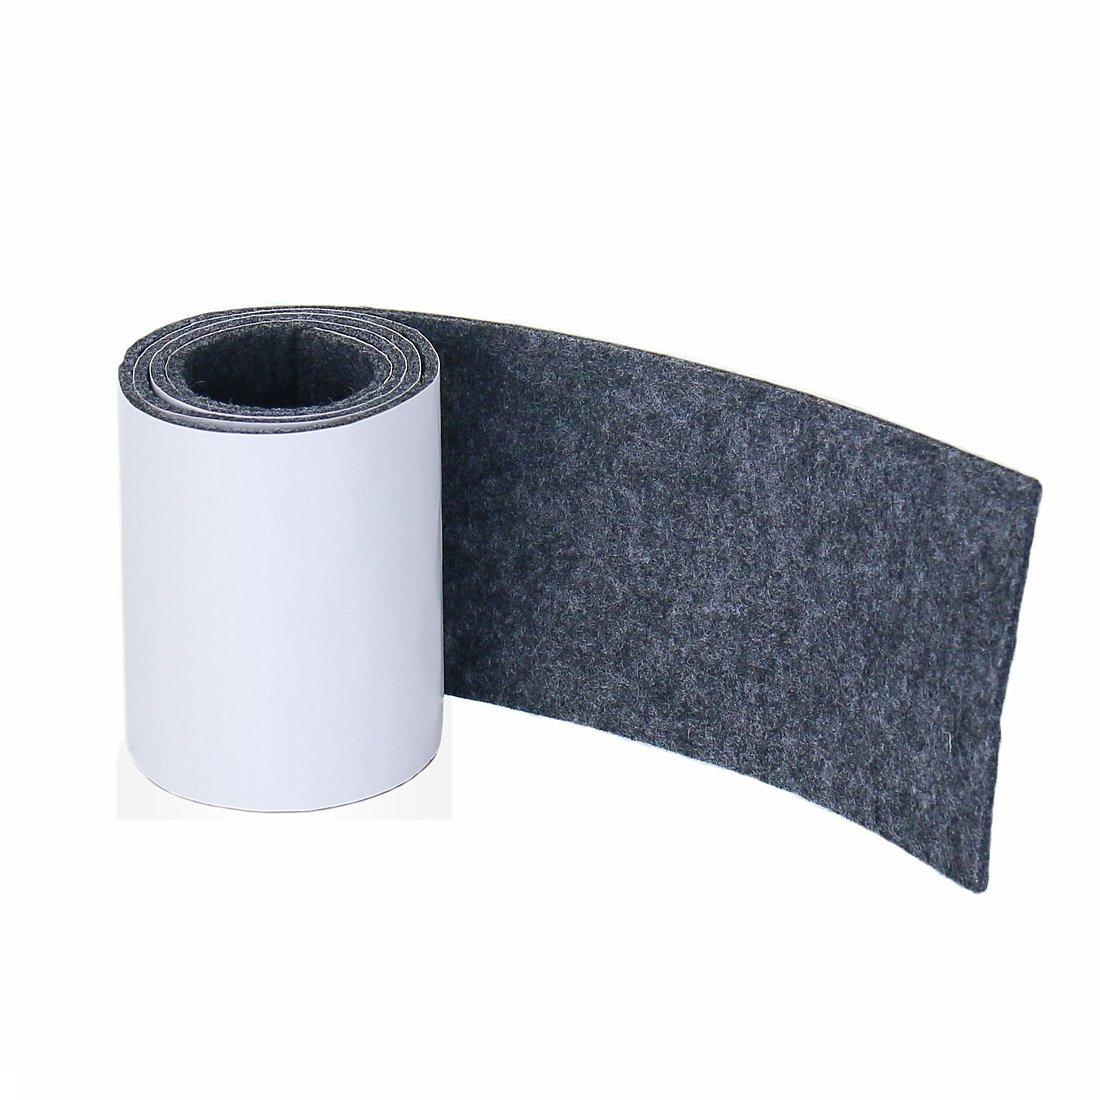 Felt Pads Floor Protector Pads DIY Self Adhesive Furniture Pad Felt Chair Leg Pads 39.37 x 3.93 Black